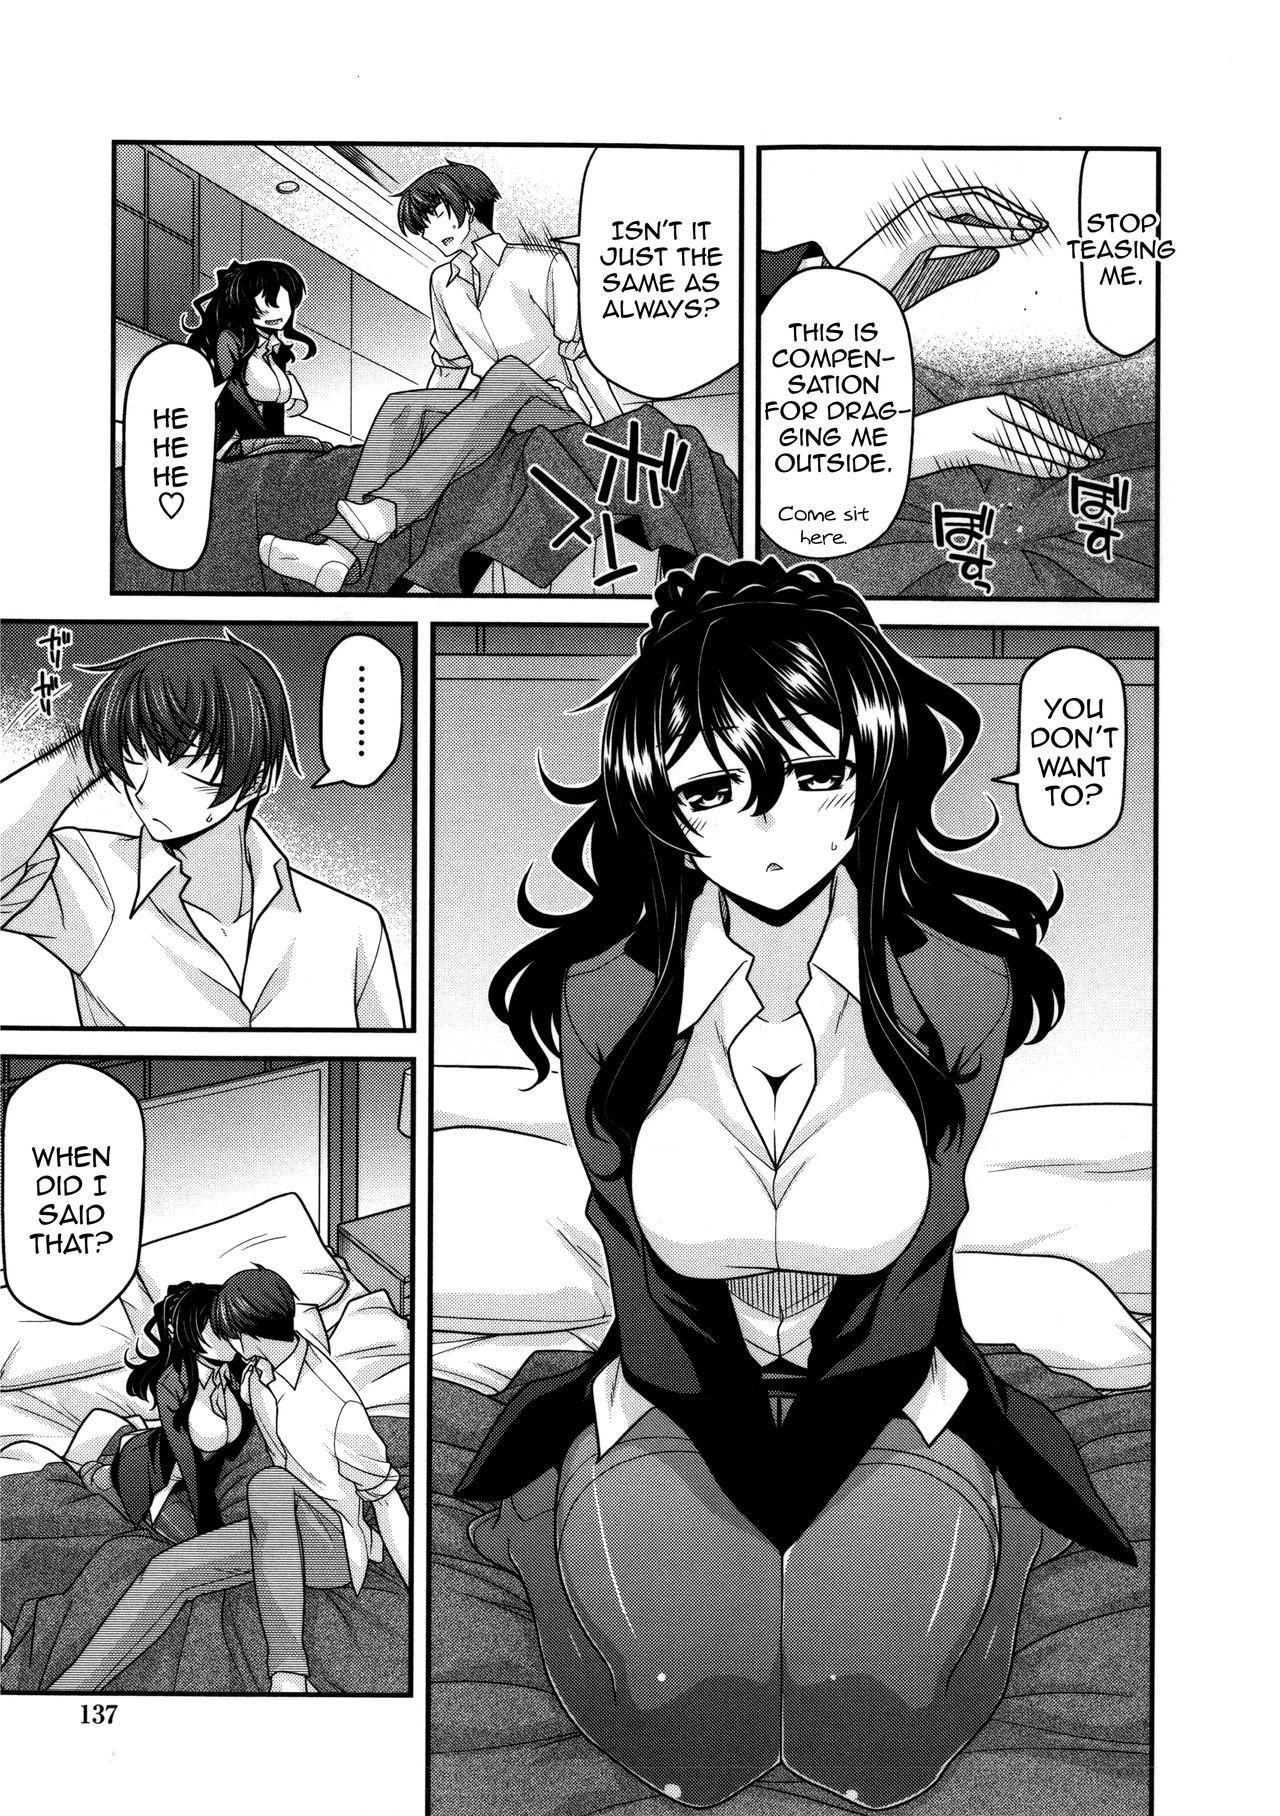 [Miyashiro Sousuke] Yamato Nadeshiko Chichi Henge - Yamato Nadeshiko Breast Changes Ch. 0-1, 4-5, 7-9 [English] 73